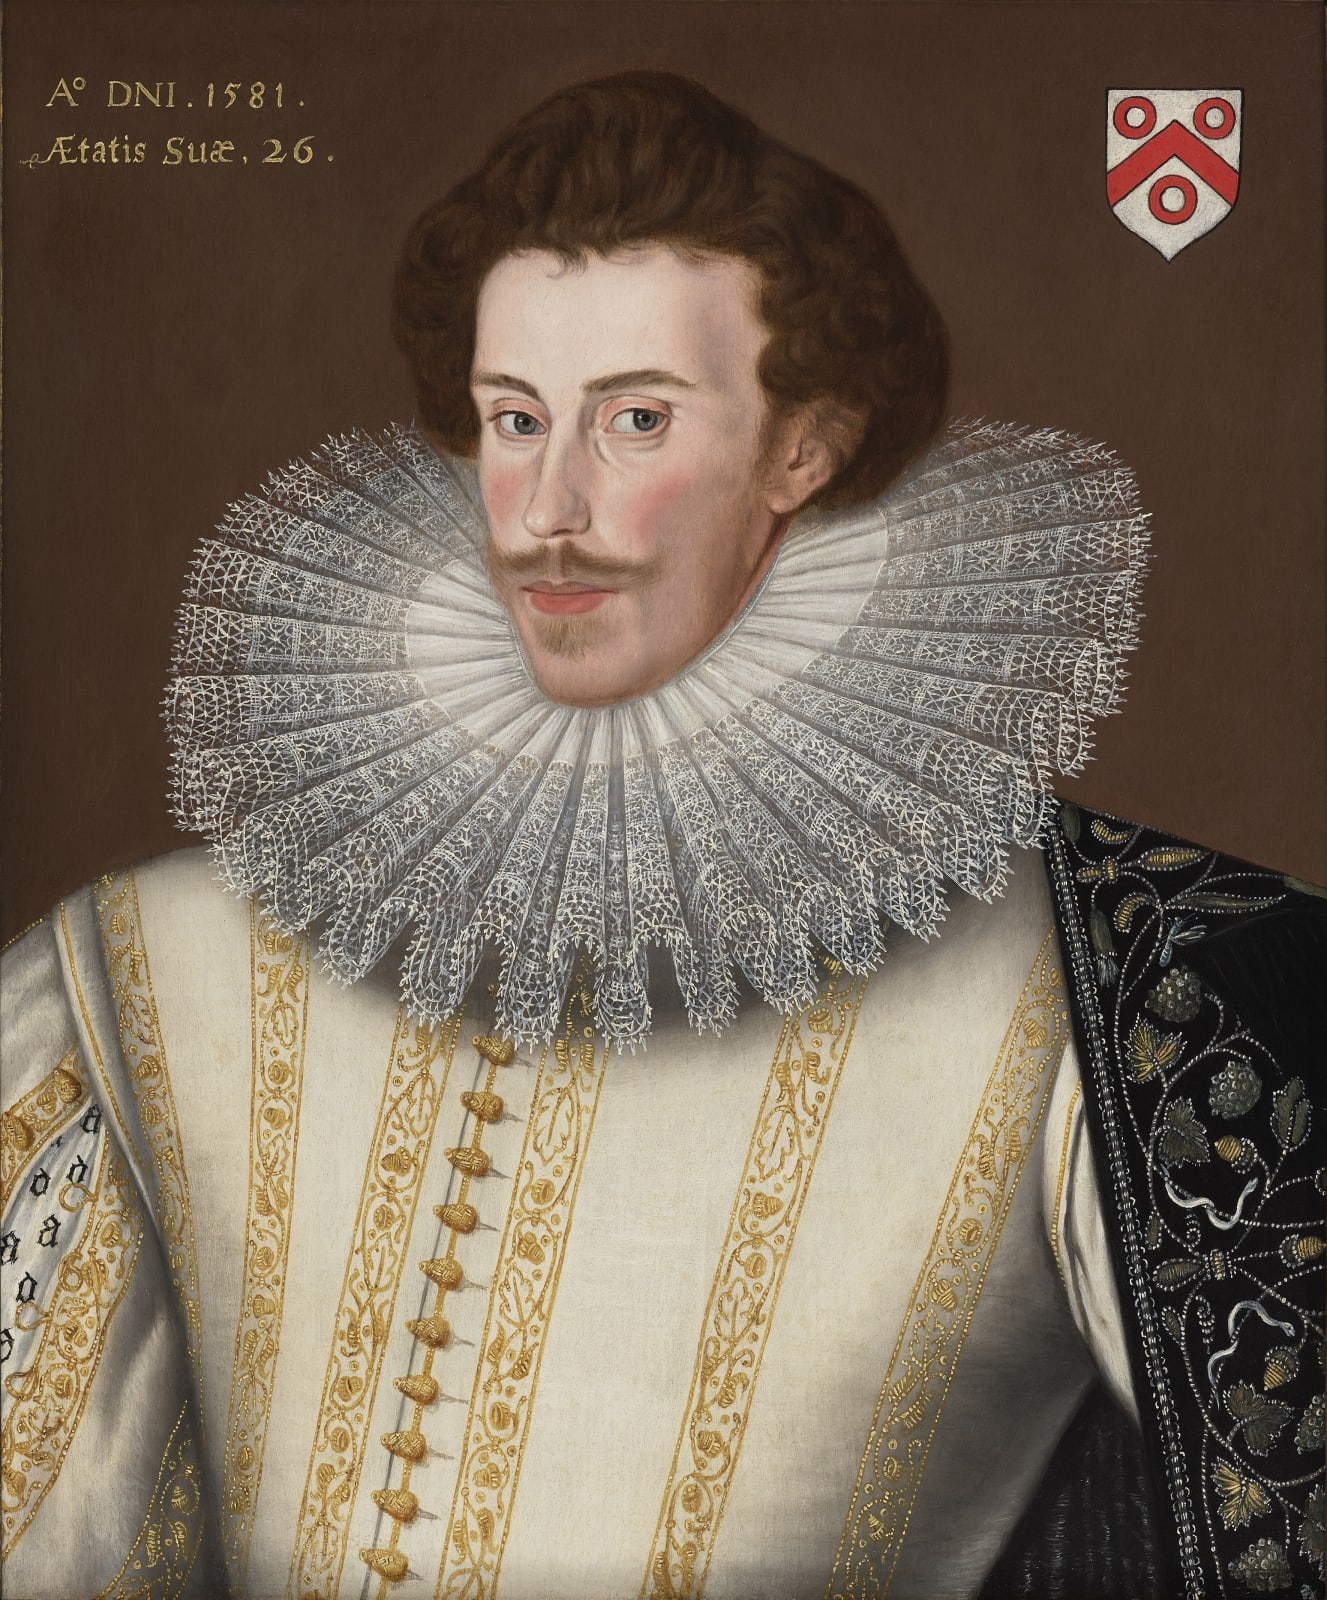 George Goring Jnr. (c.1555 – 1602) of Ovingdean and Danny Park, Hurstpierpoint, Sussex